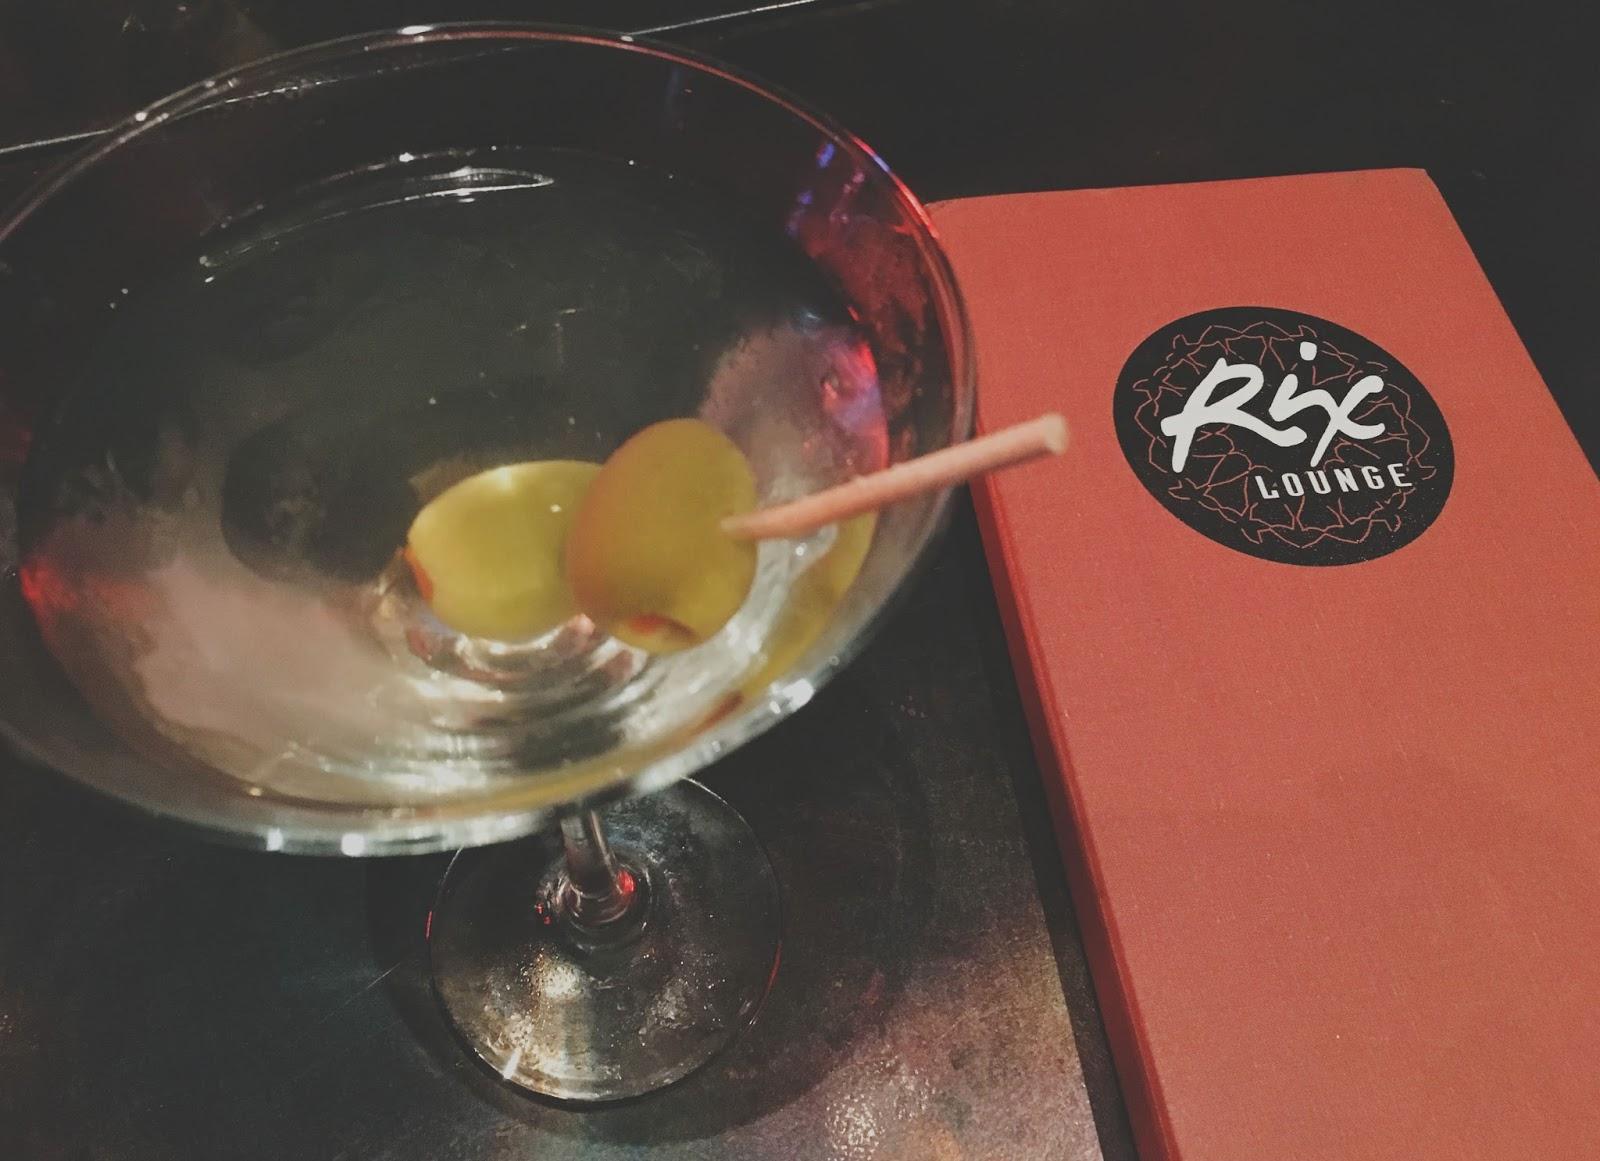 martini at Rix Lounge in Disney World, Florida